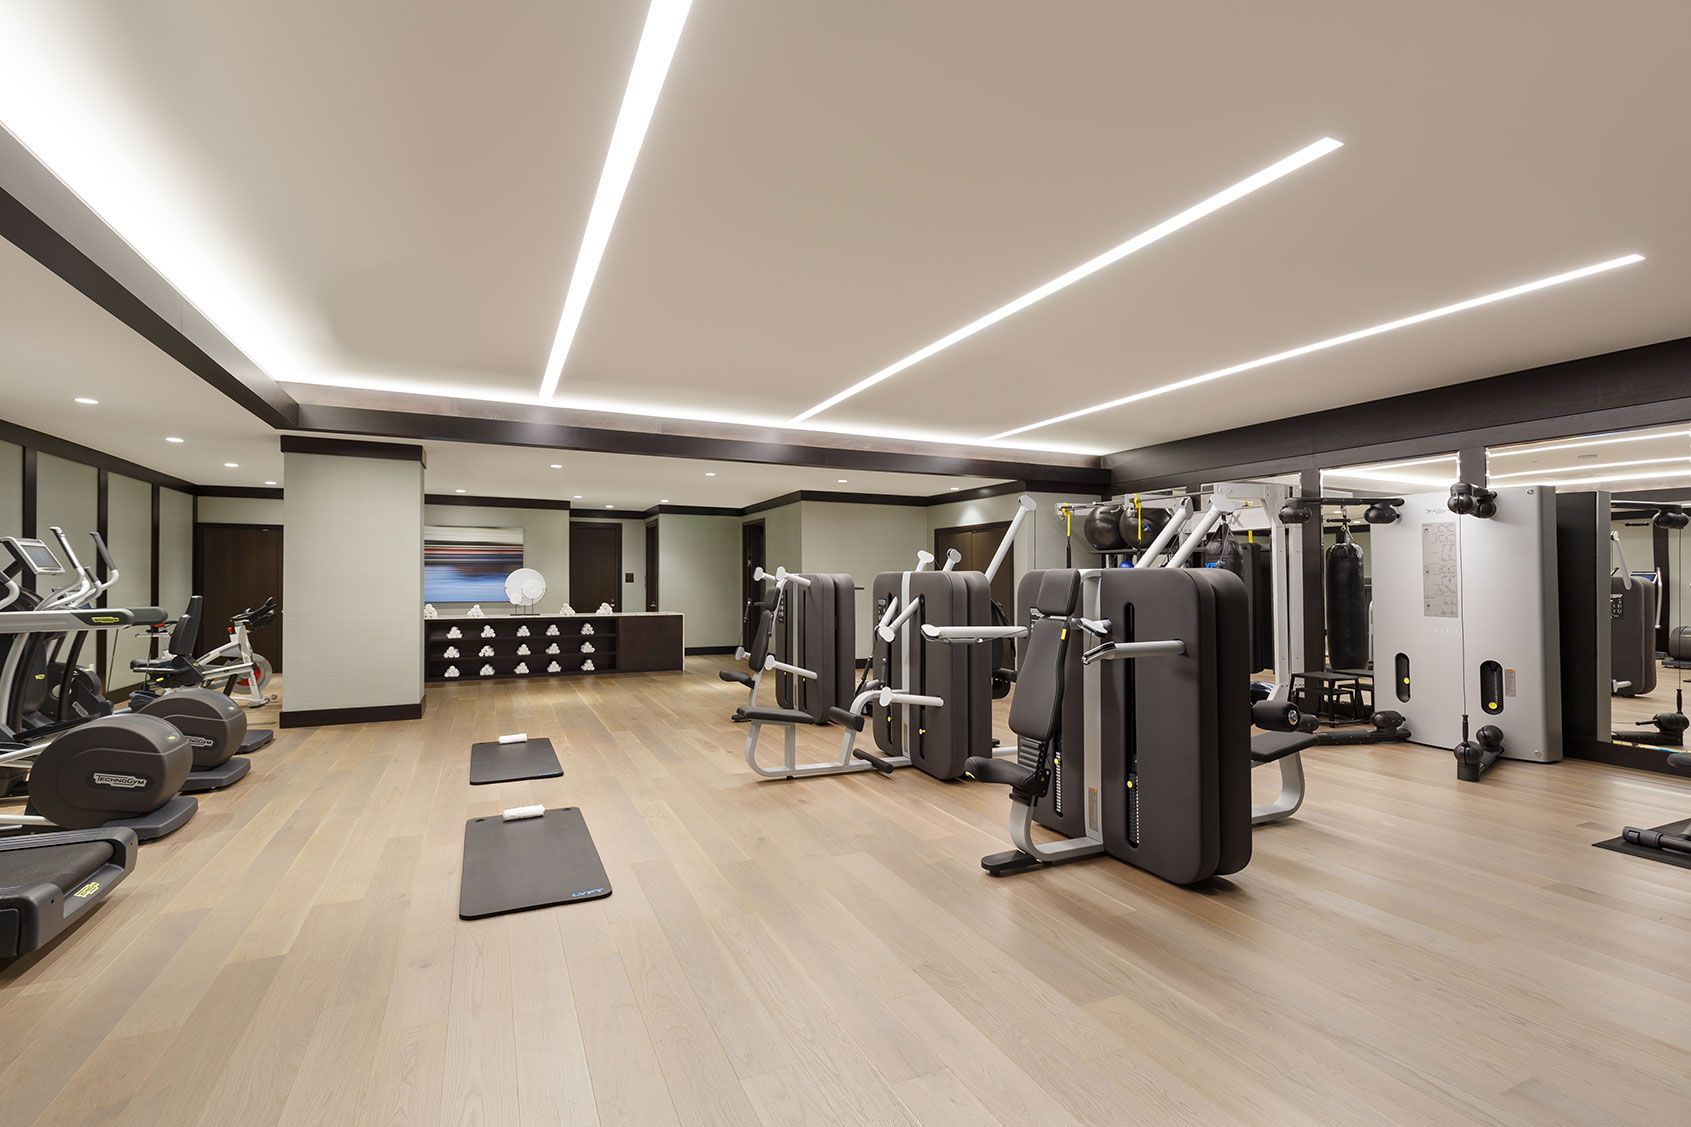 Gym Led Lighting The Pacific Condominium Complex Aion